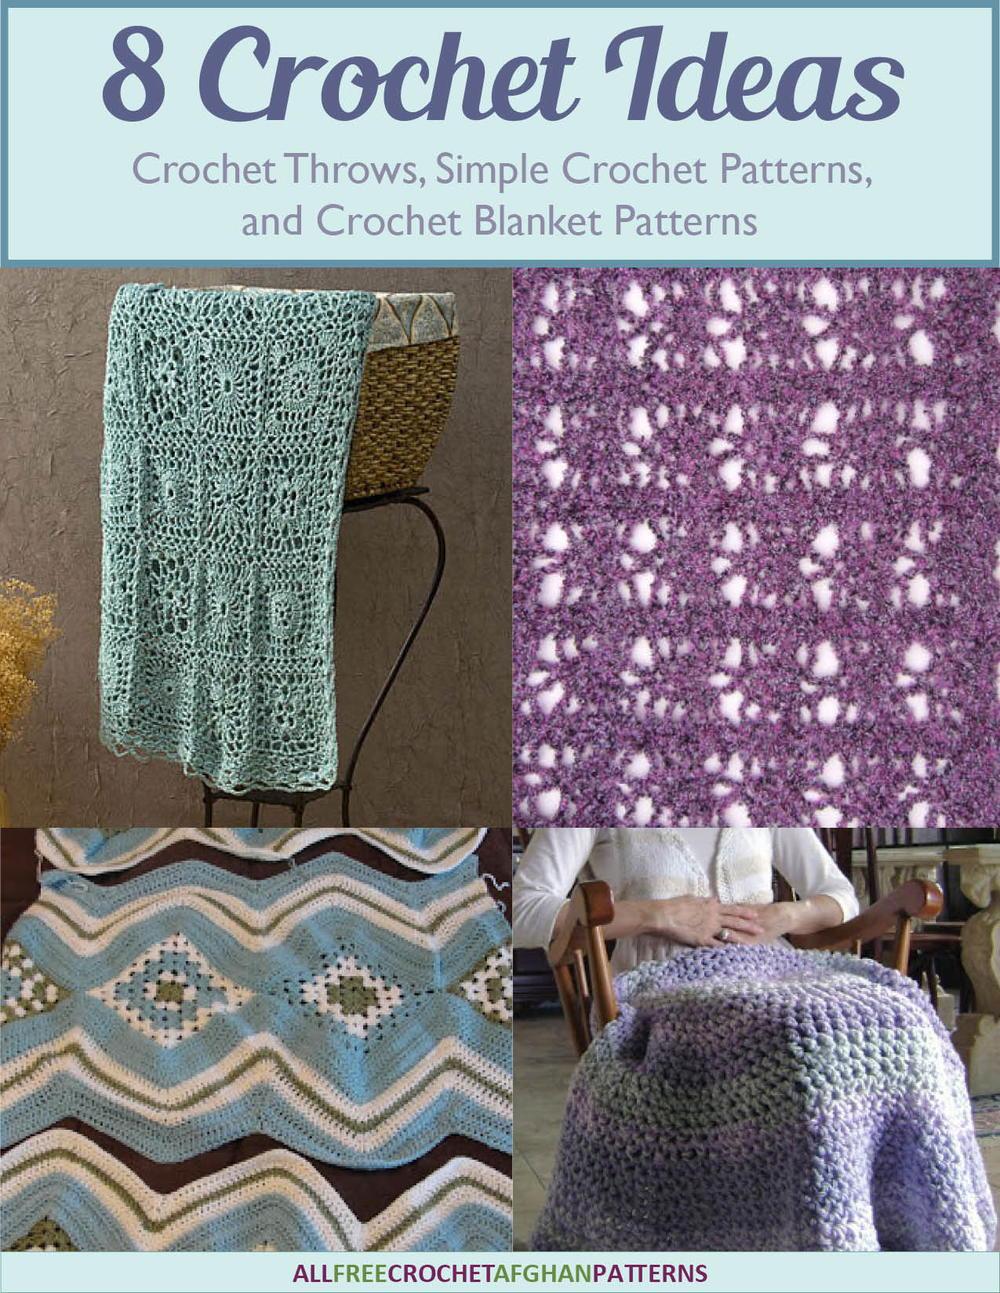 8 Crochet Ideas For Crochet Throws Simple Crochet